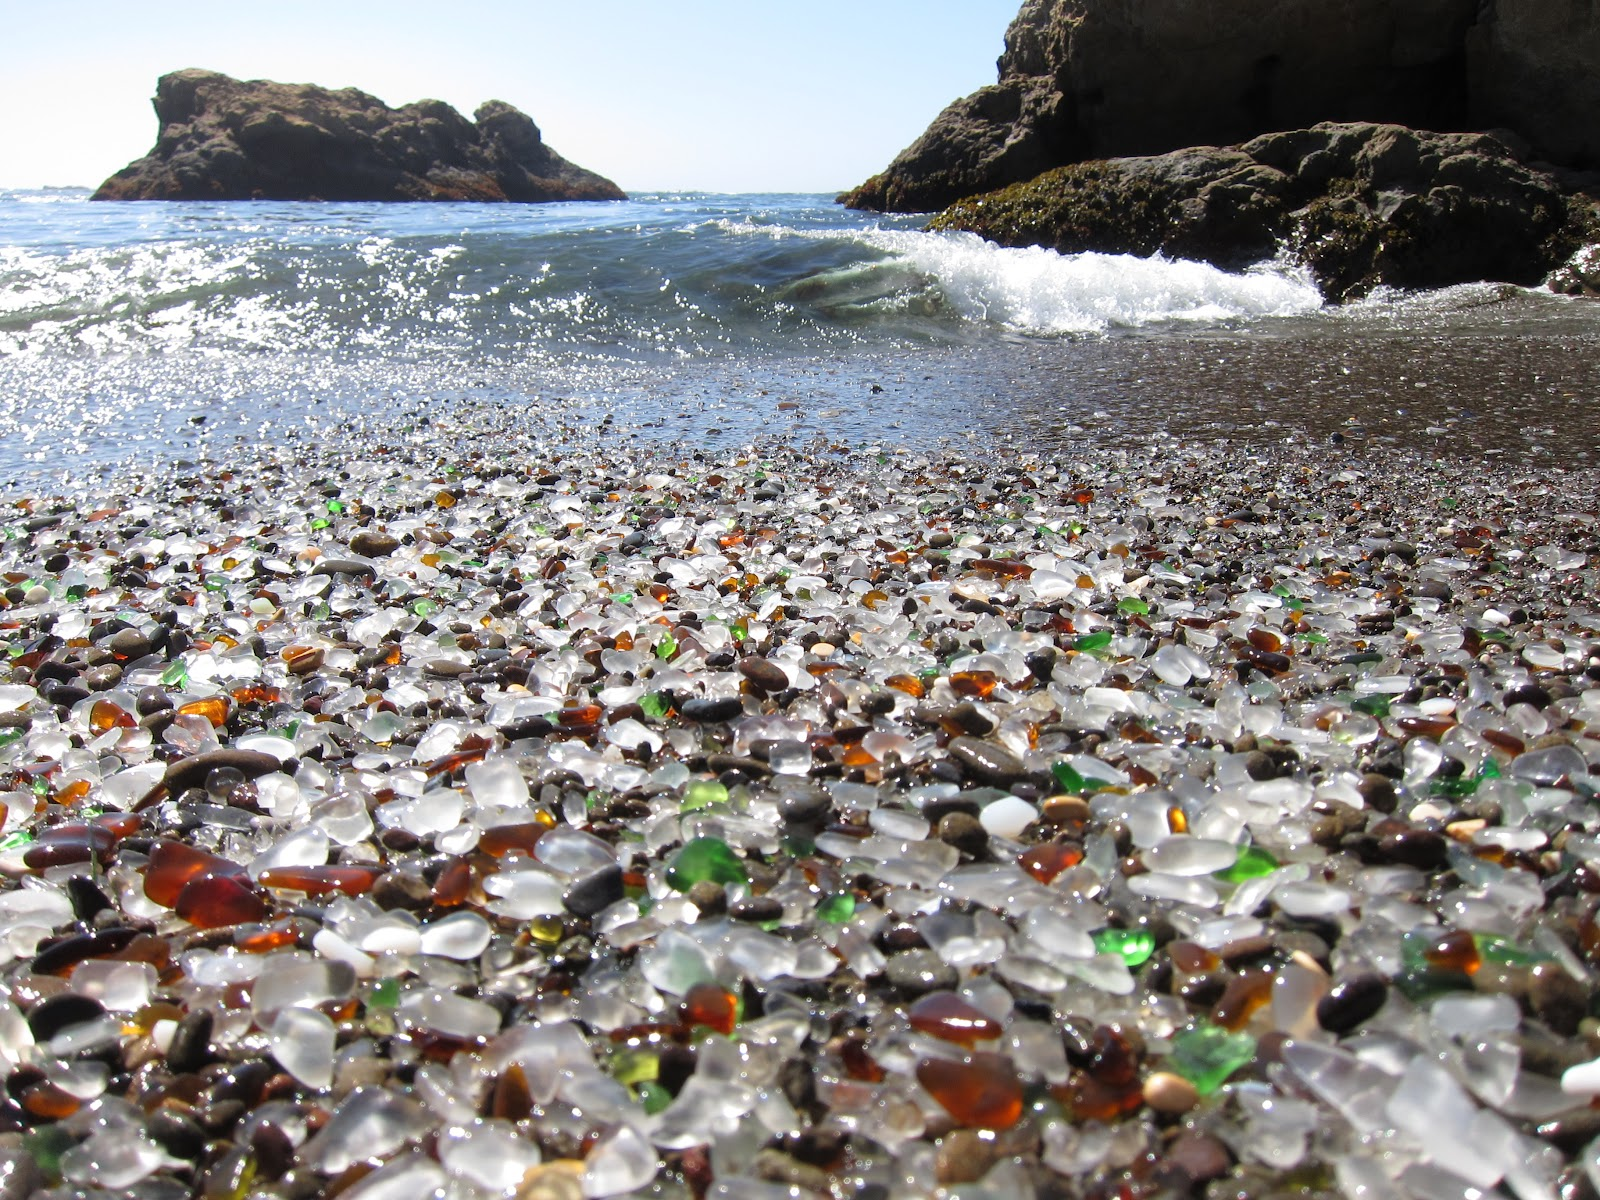 Nate's Nonsense: Glass Beach (Fort Bragg, California